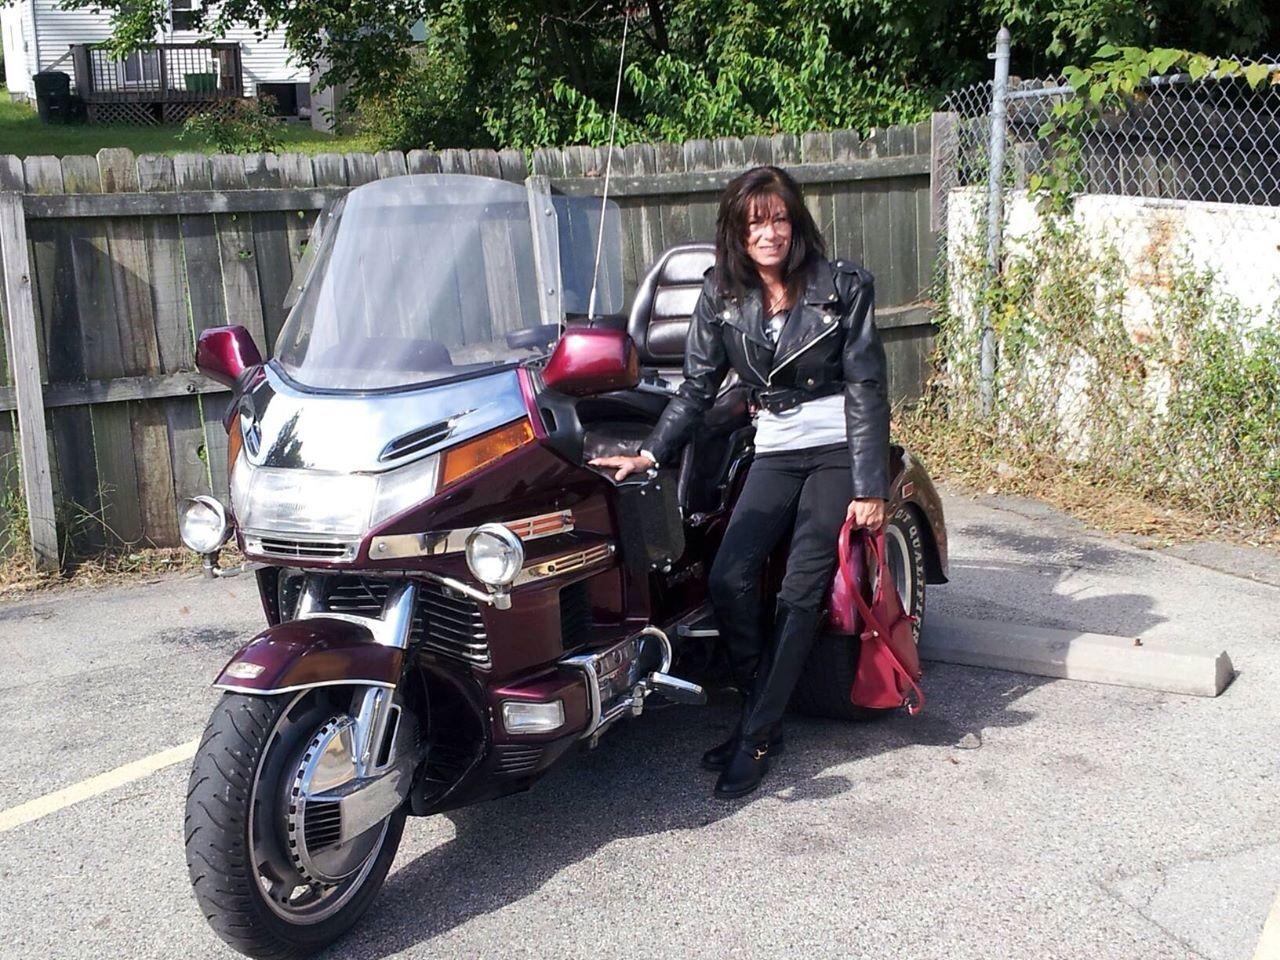 0ce32e897cbbf000cff07956c306a4eb www motosikletaksesuarlari com dainese deri bayan  at gsmx.co